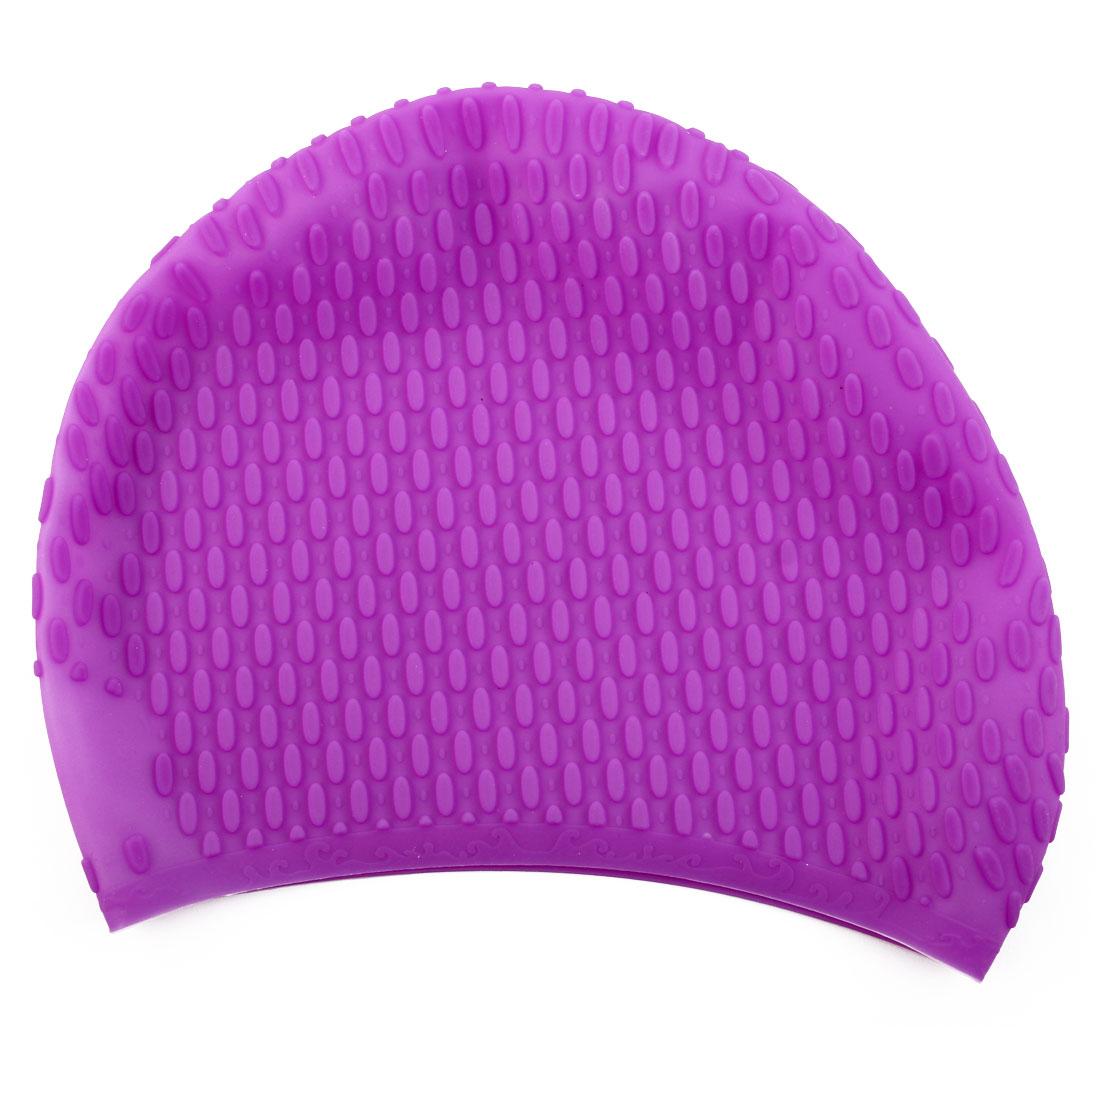 Adult Unisex Silicone Dome Shape Anti-slip Elastic Swimming Cap Underwater Bathing Hat Purple